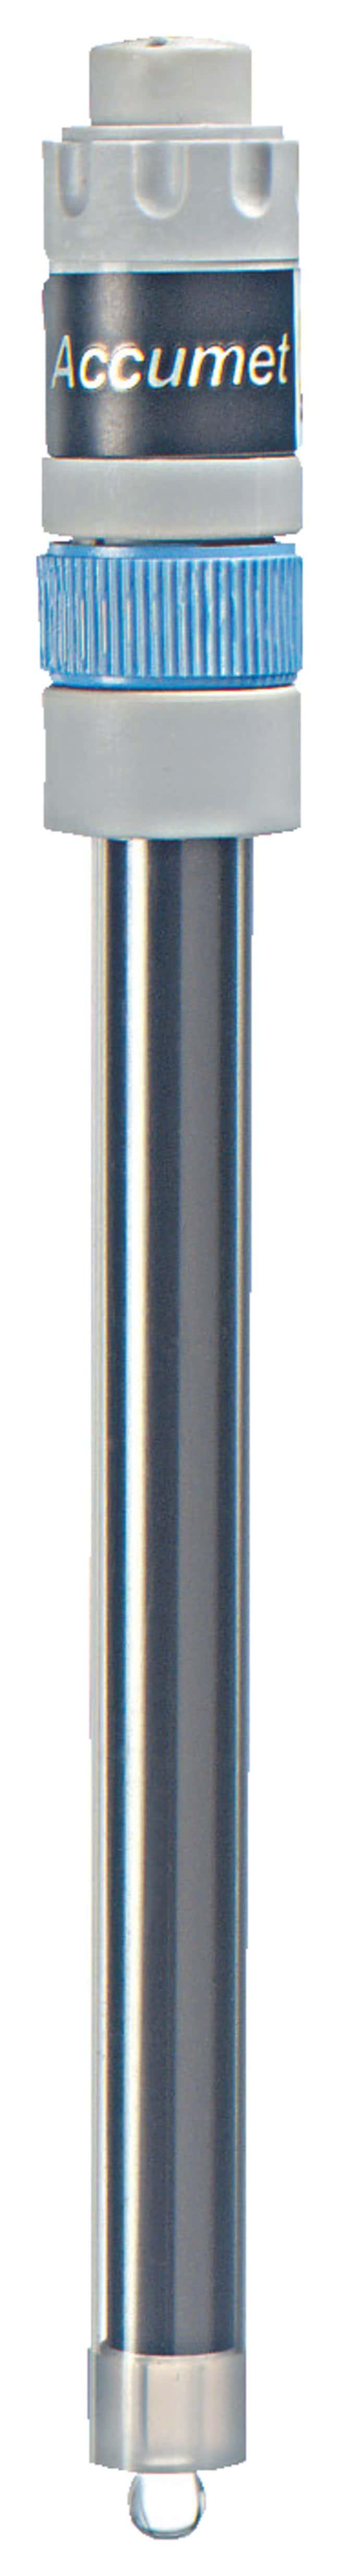 Fisherbrand accumet pH Indicating Epoxy Body Glass Membrane Models - Mercury